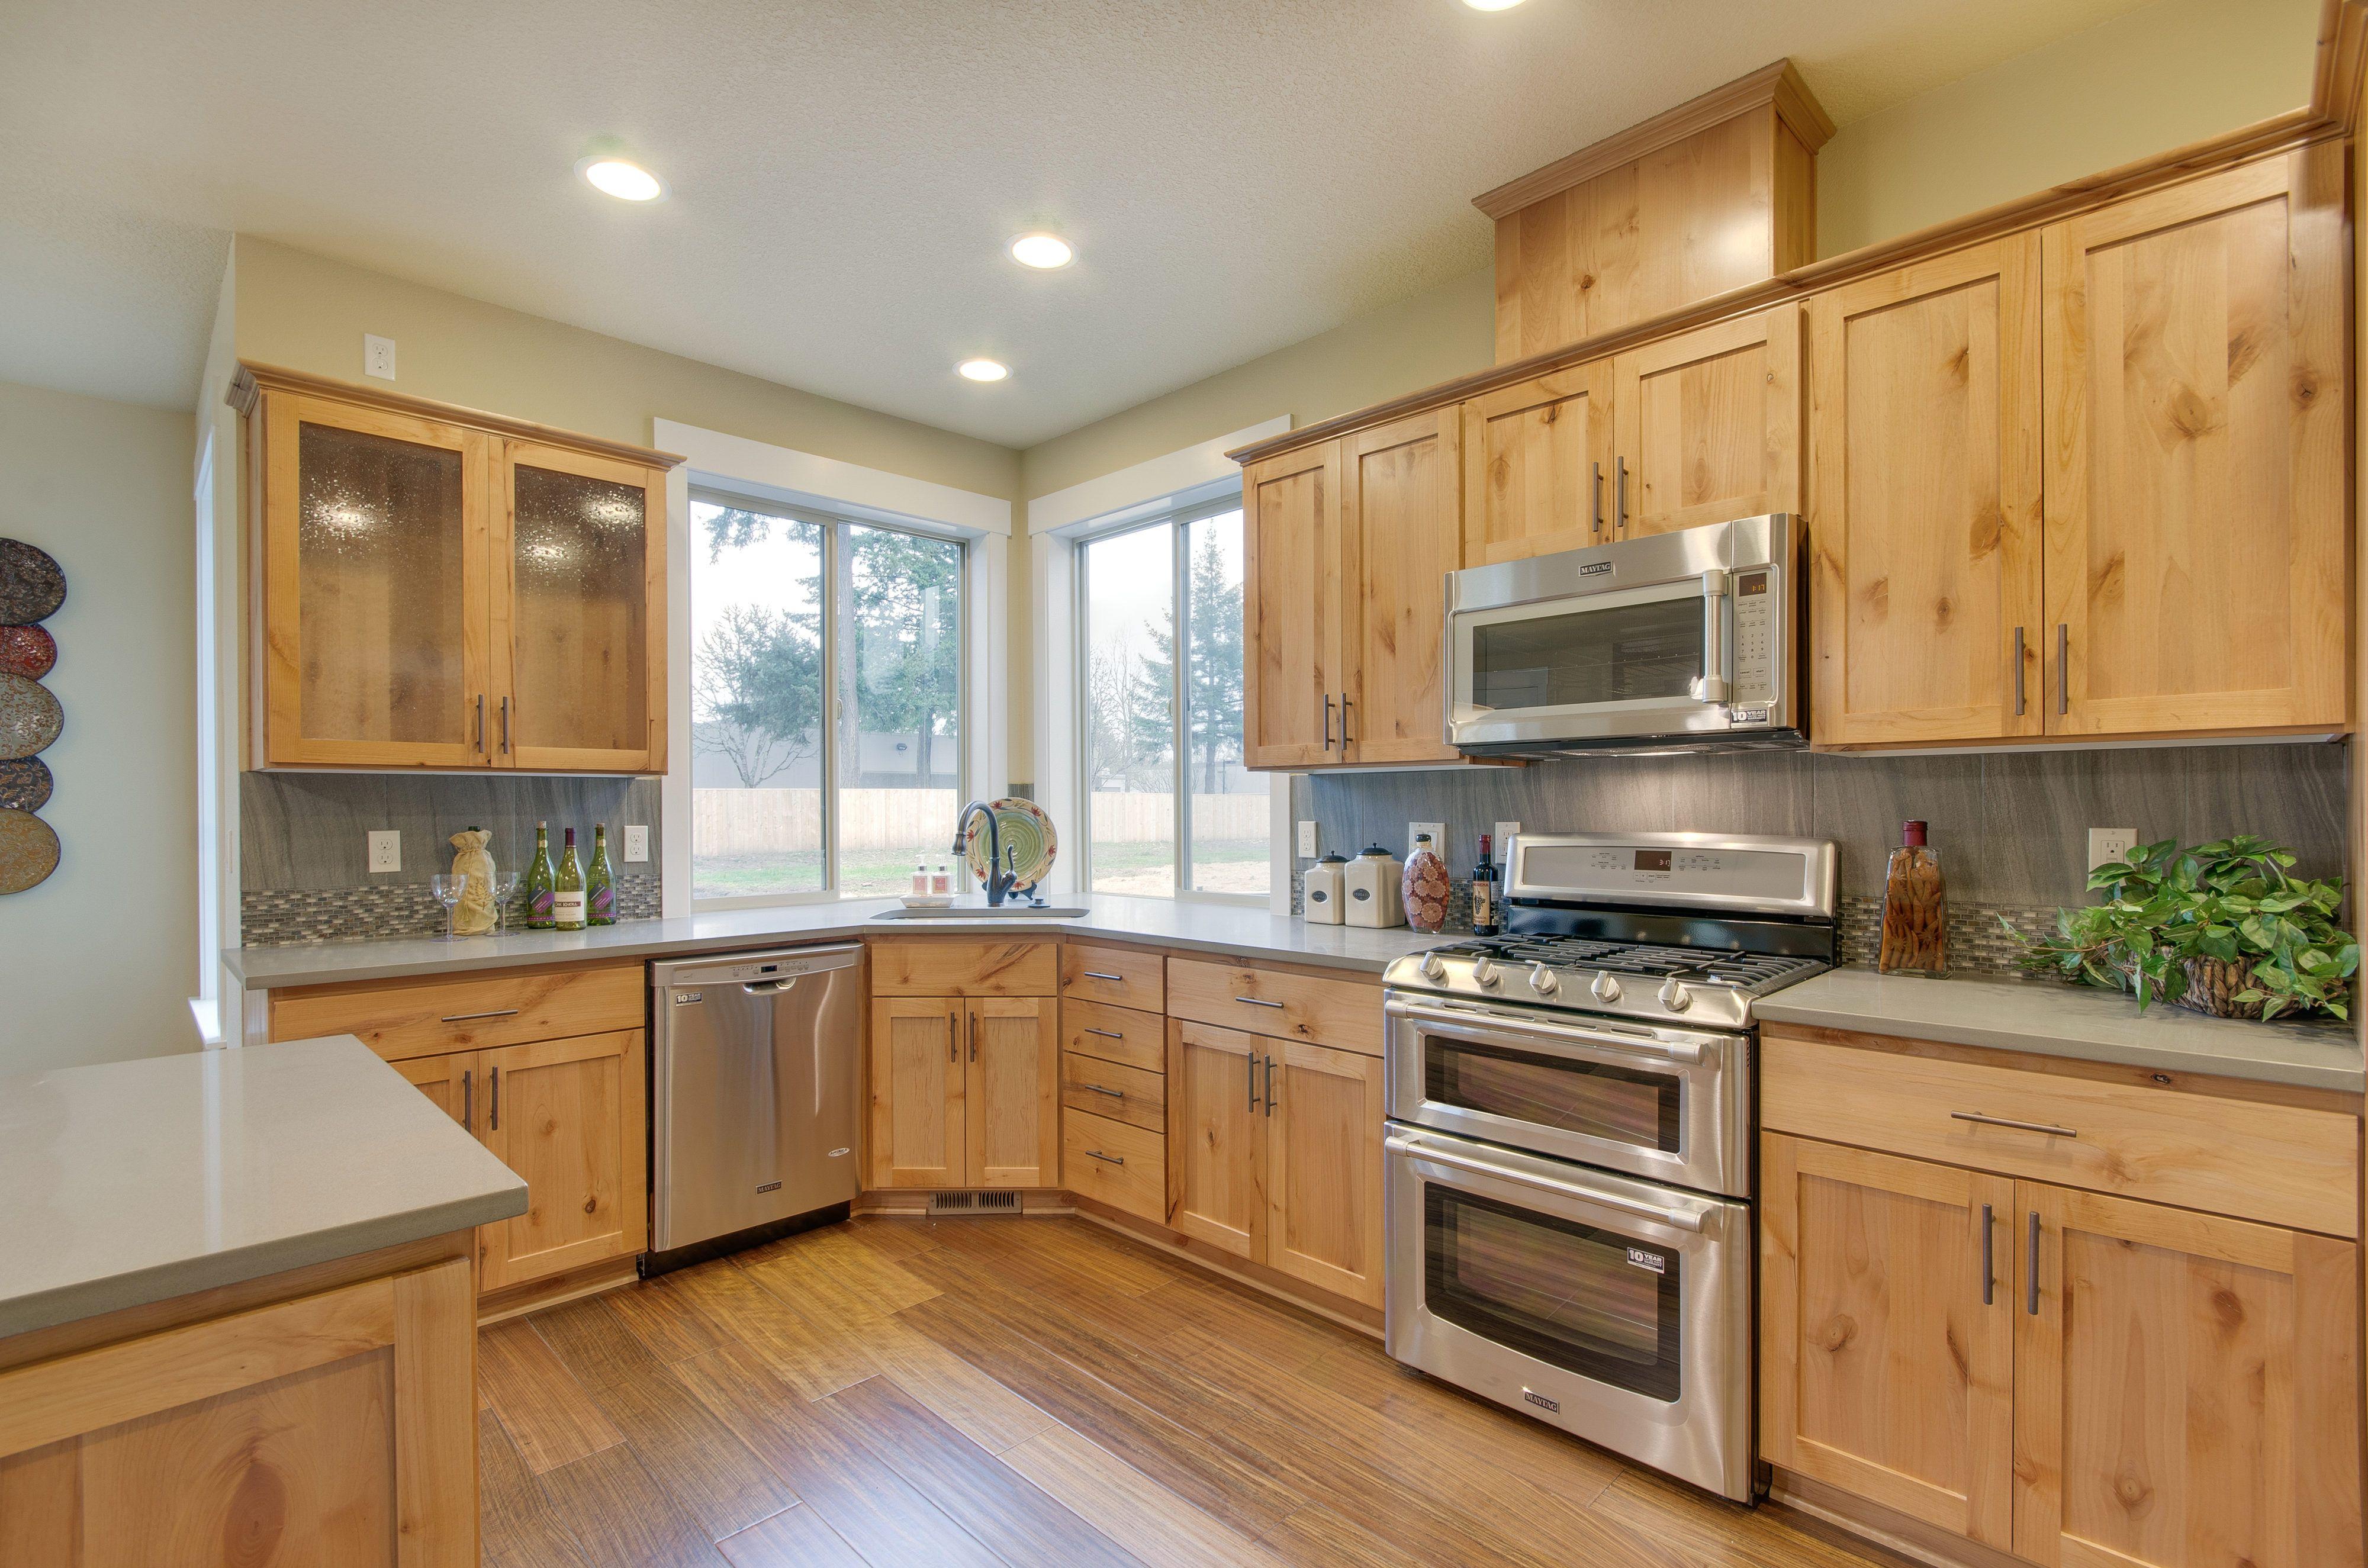 Kitchen With Knotty Alder Cabinetry Slab Quartz